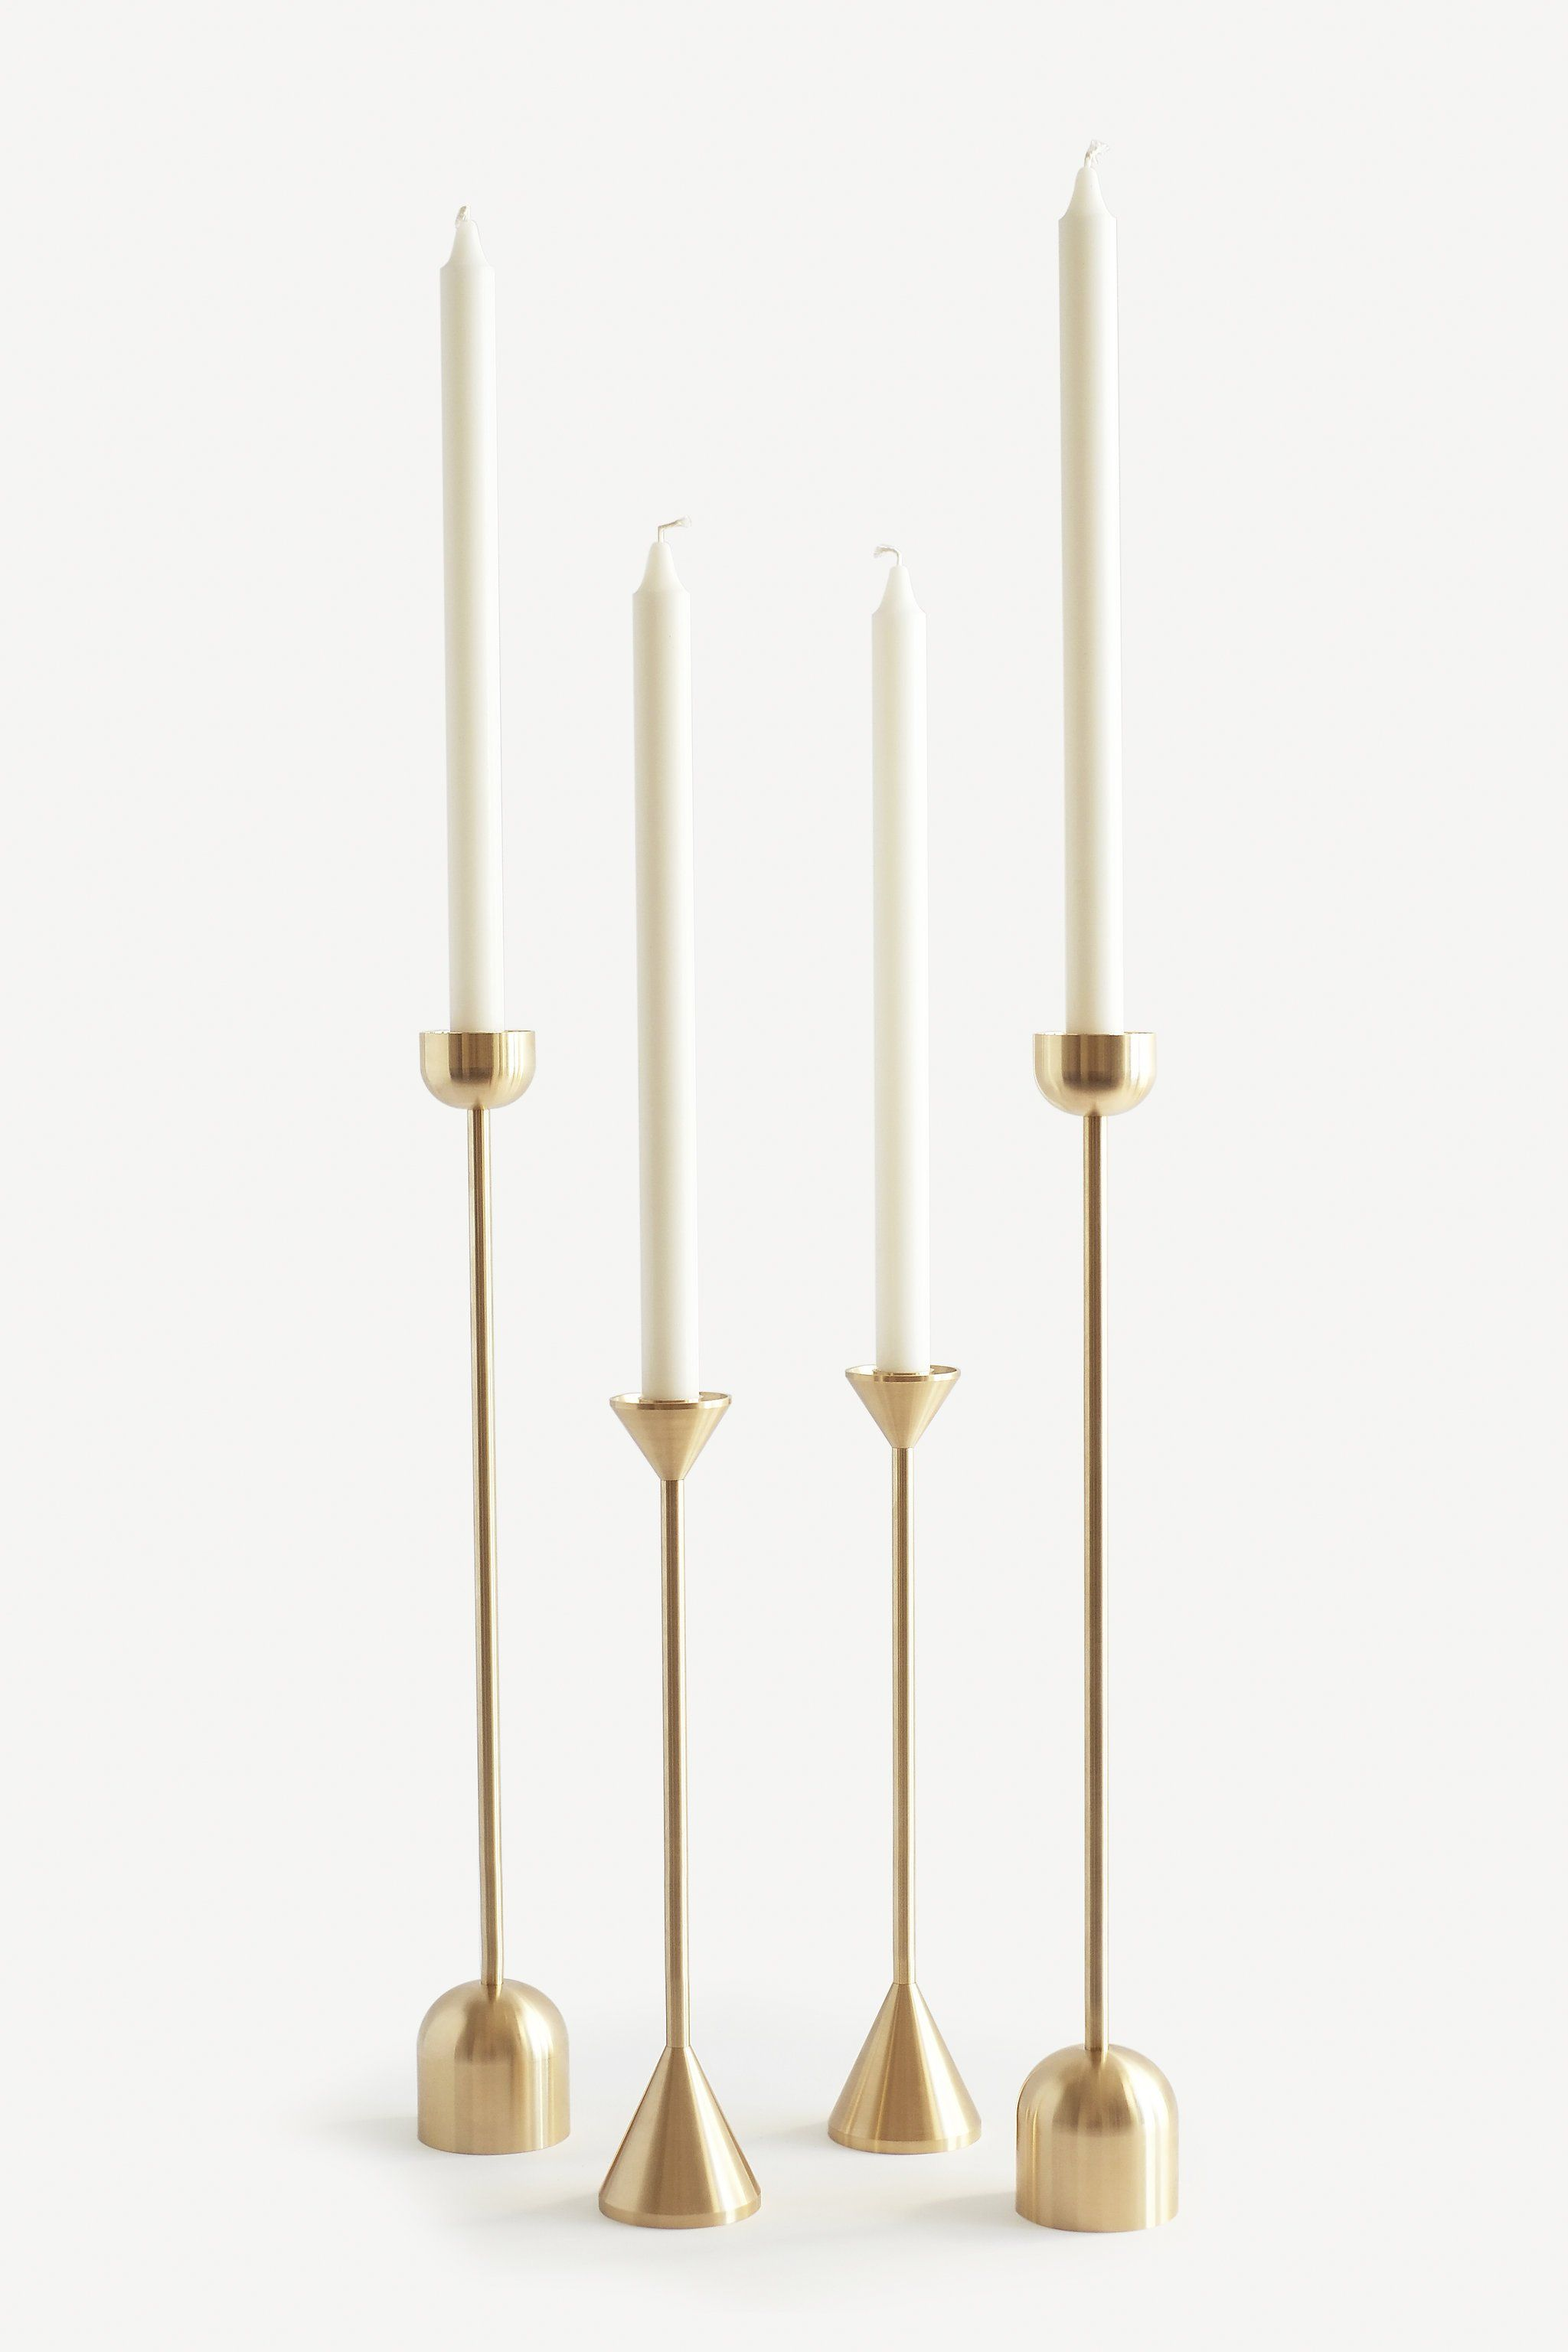 Brass Candleholder Cone Brass Candle Brass Candle Holders Skinny Candle Holders Tall taper candle holders